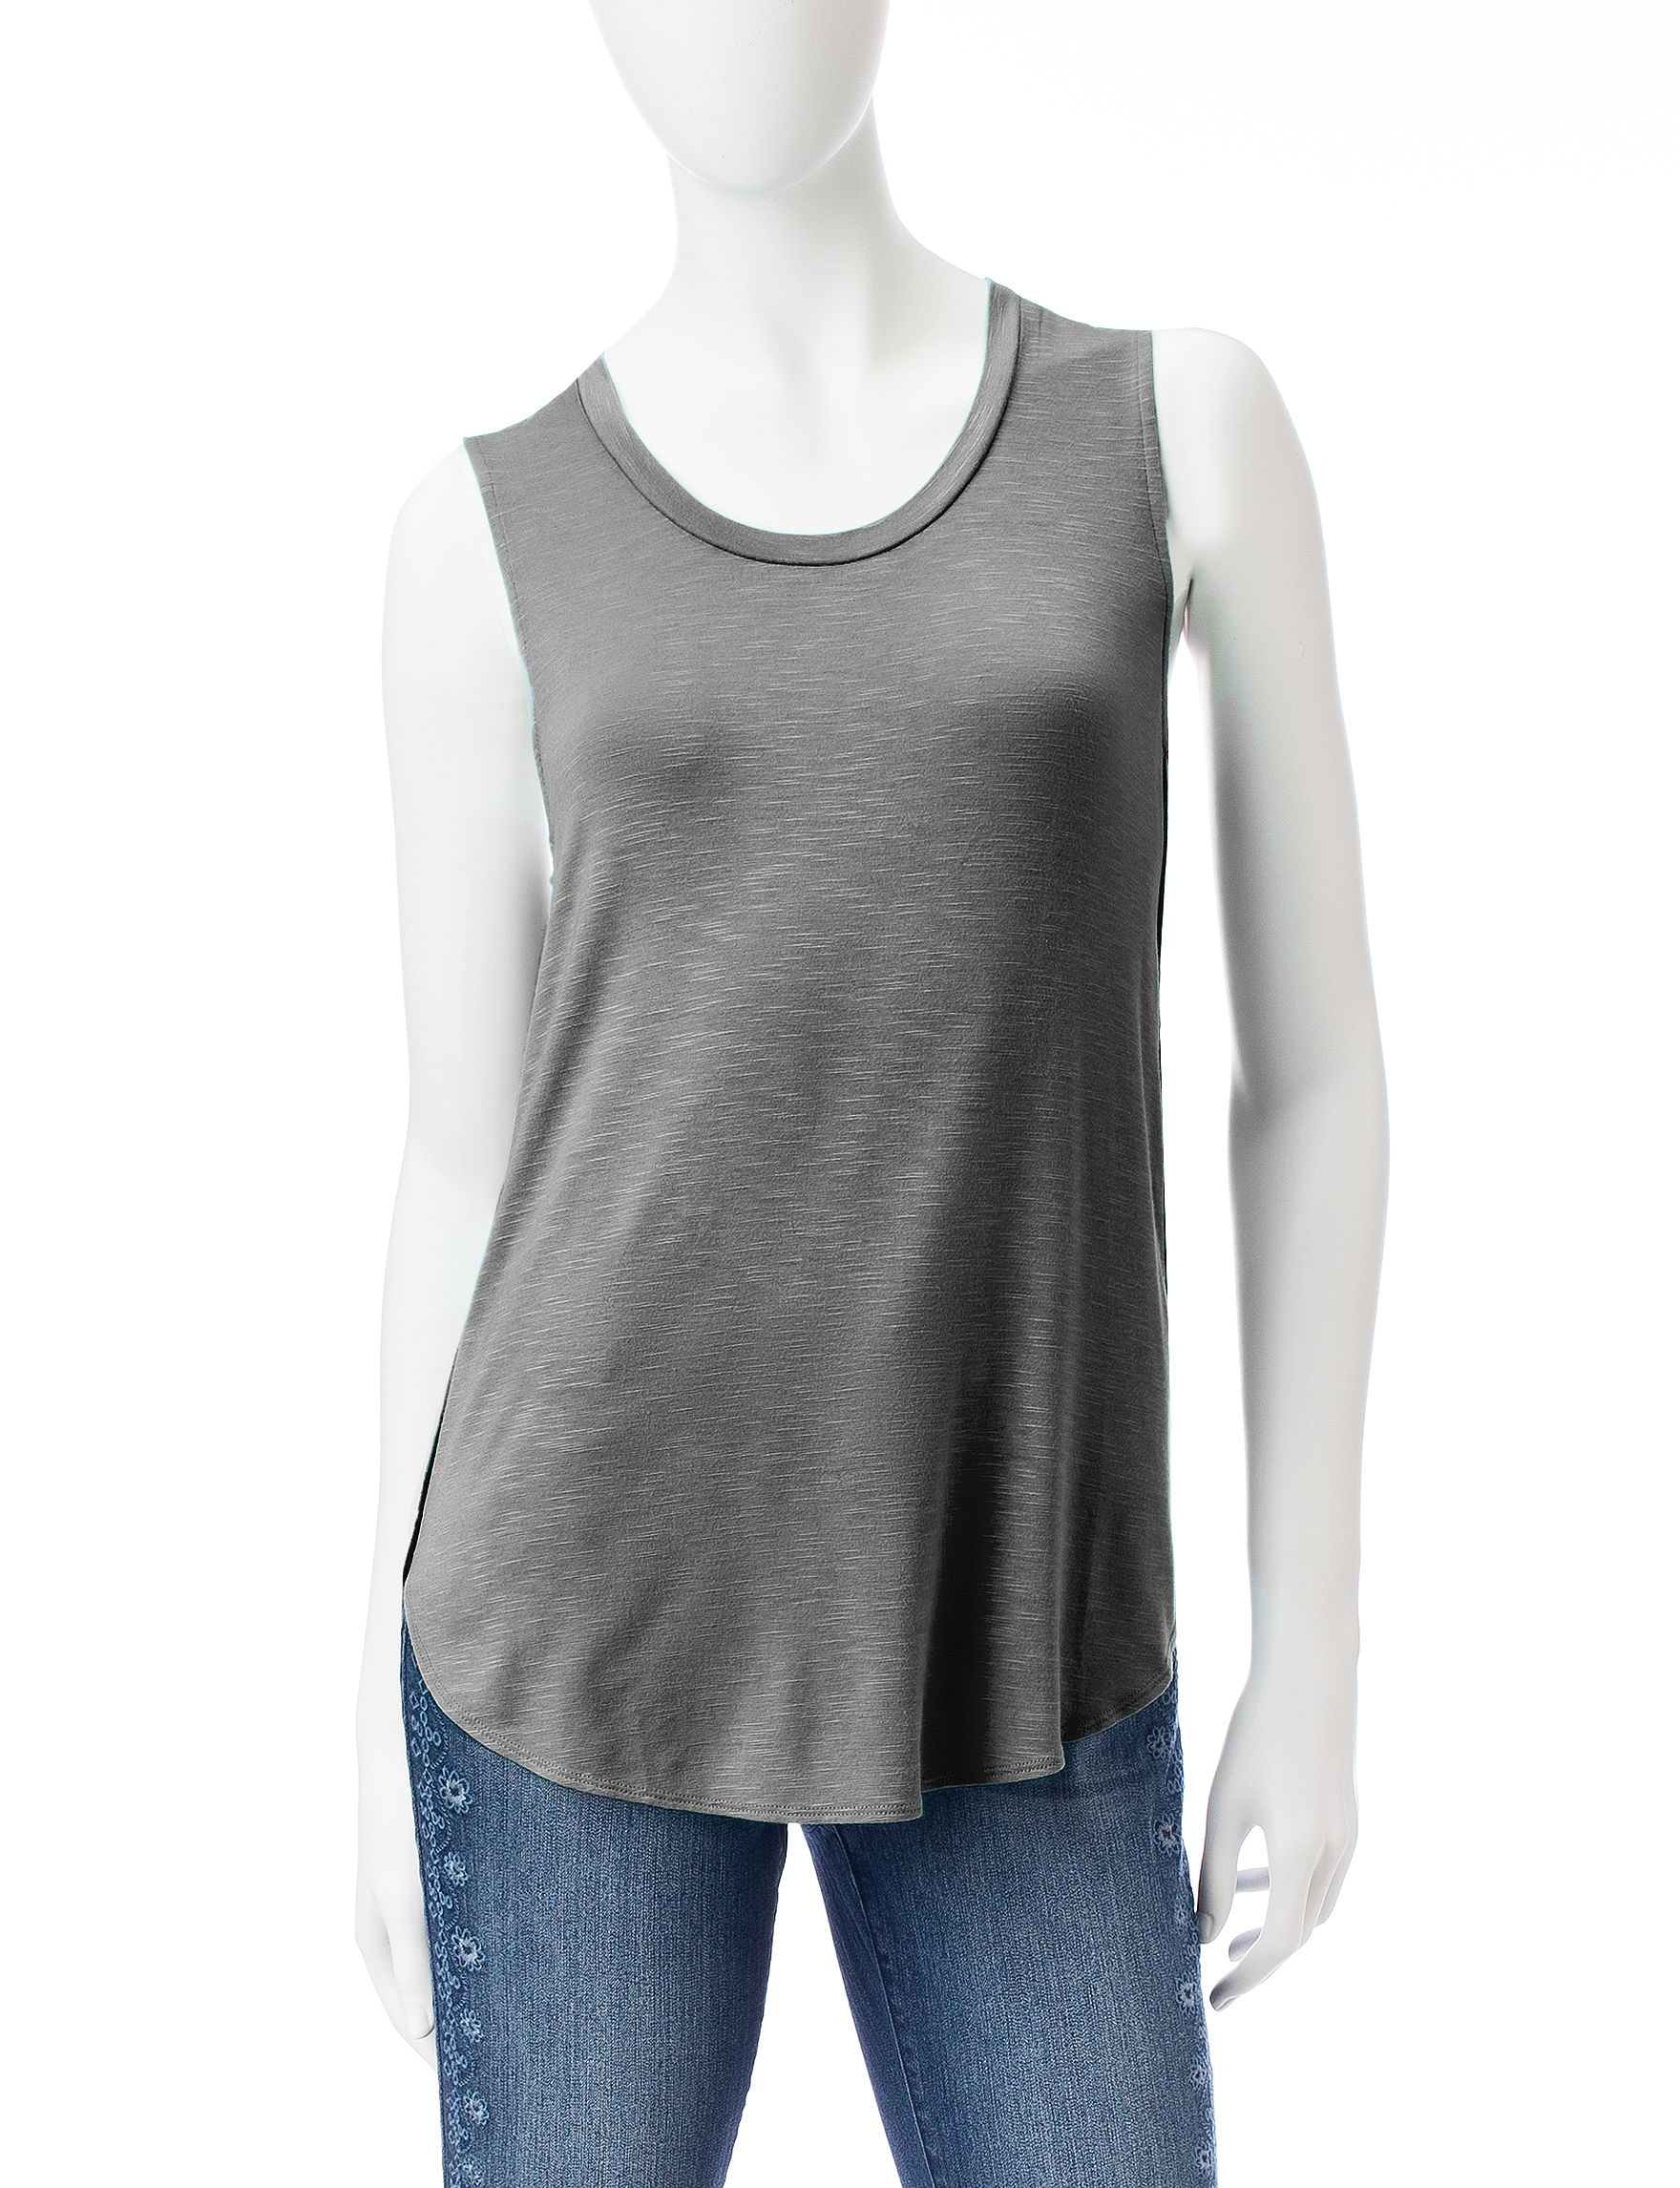 Signature Studio Charcoal Shirts & Blouses